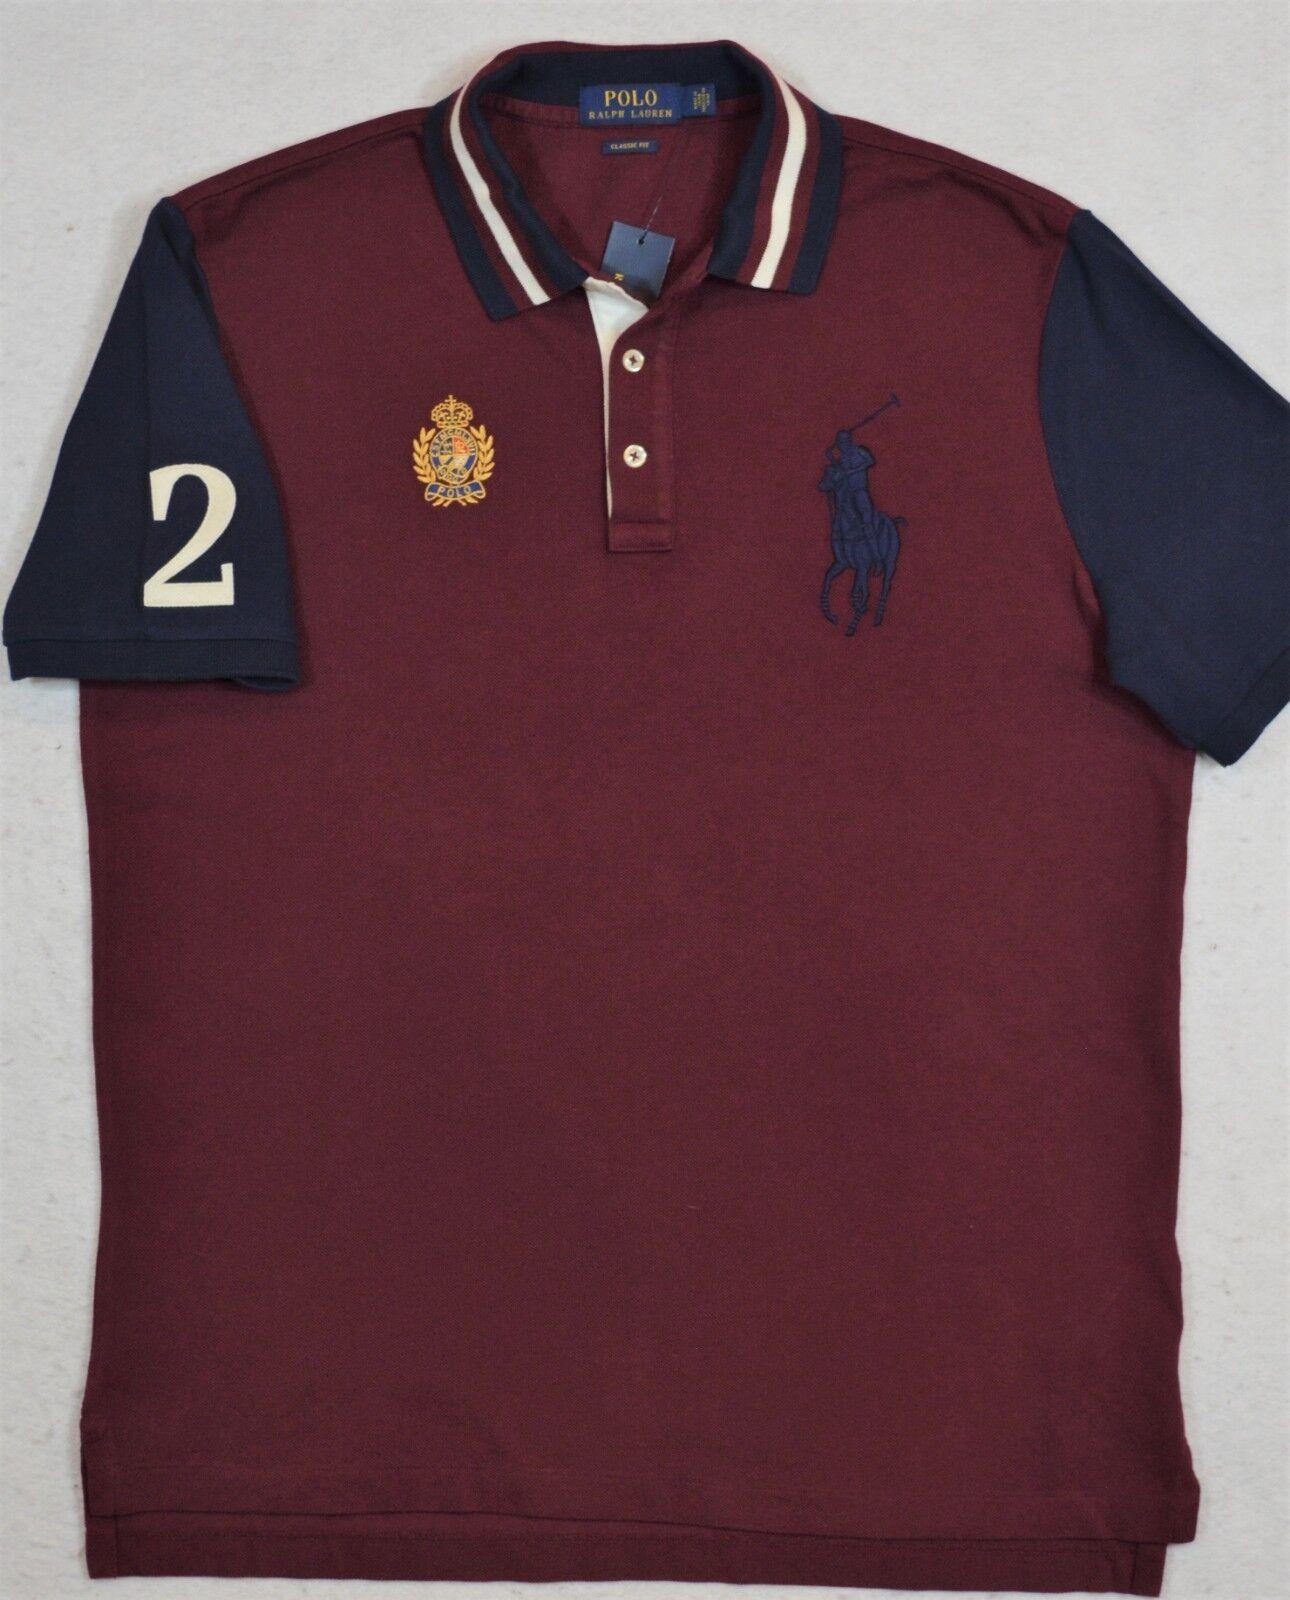 Polo Ralph Lauren Big Pony Crest Mesh Shirt L XL NWT